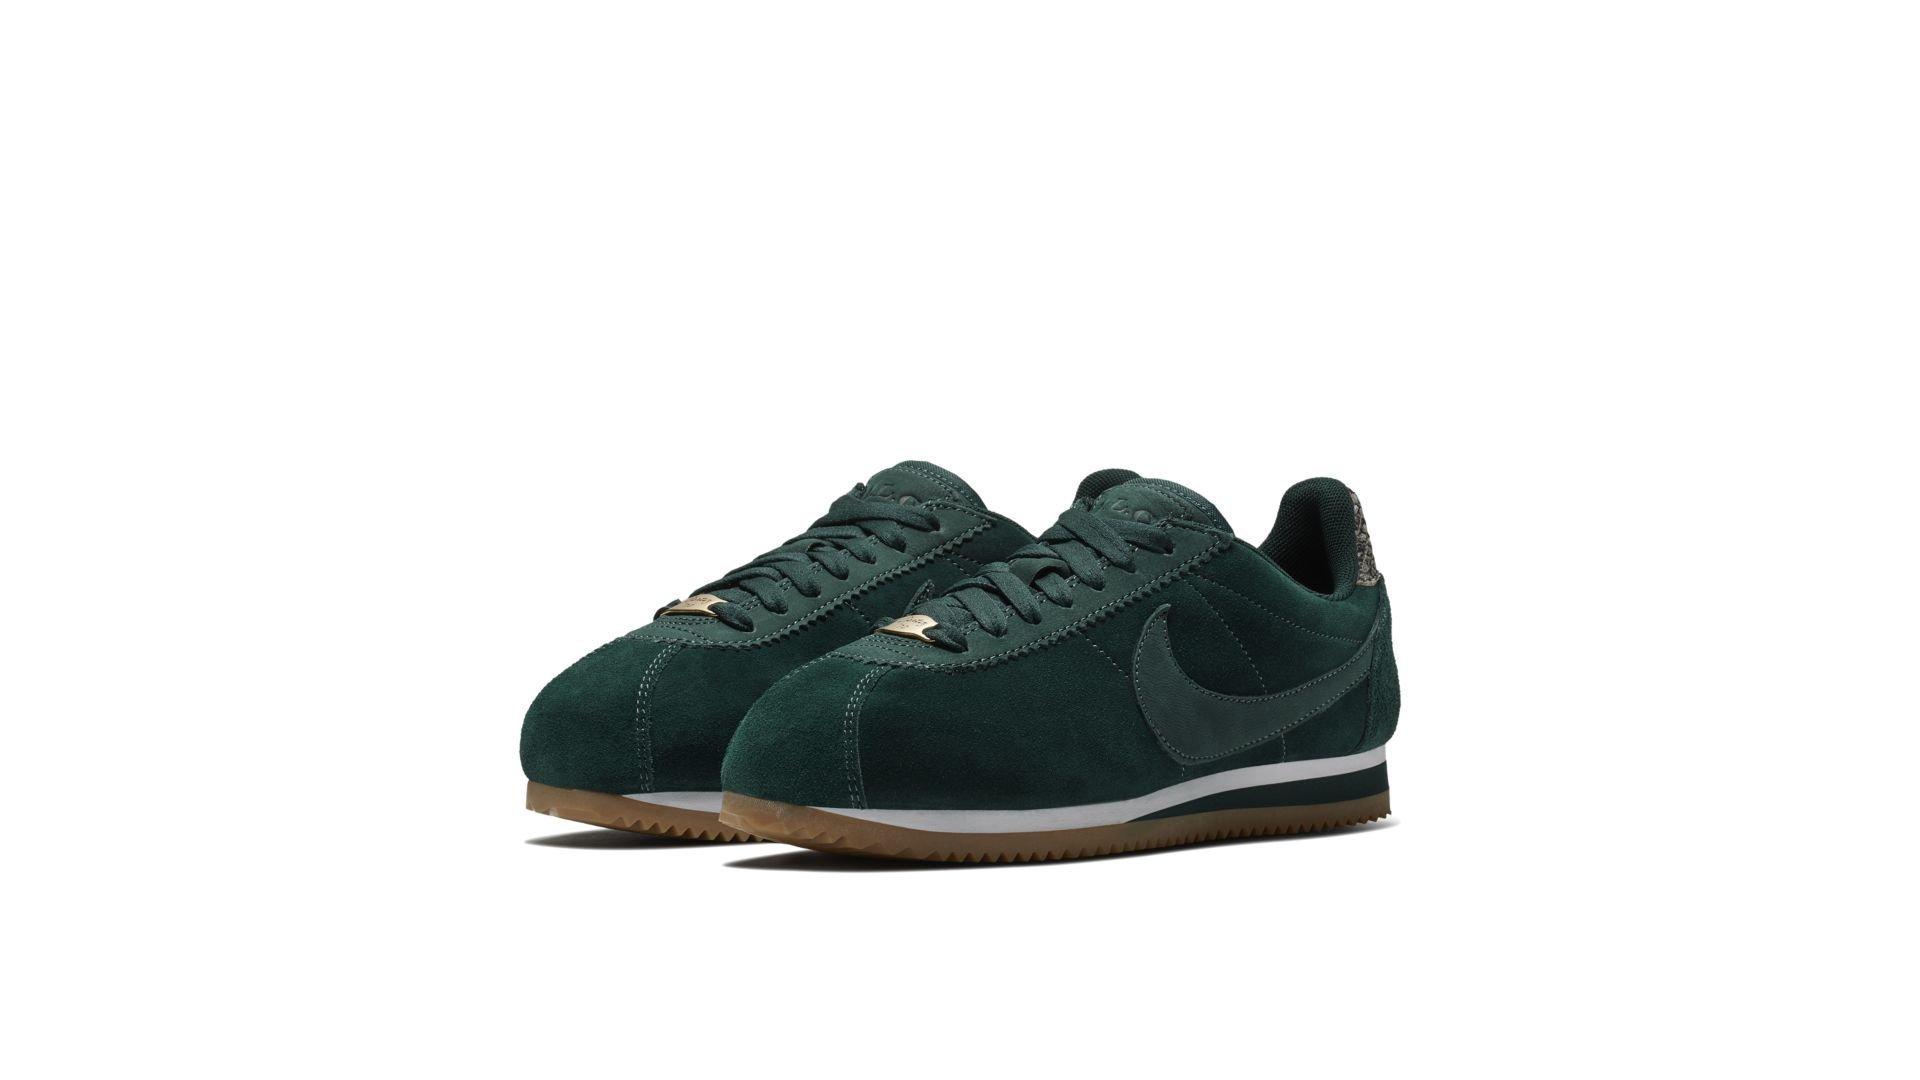 Nike Classic Cortez A.L.C. Midnight Spruce (W) (AH5206-300)